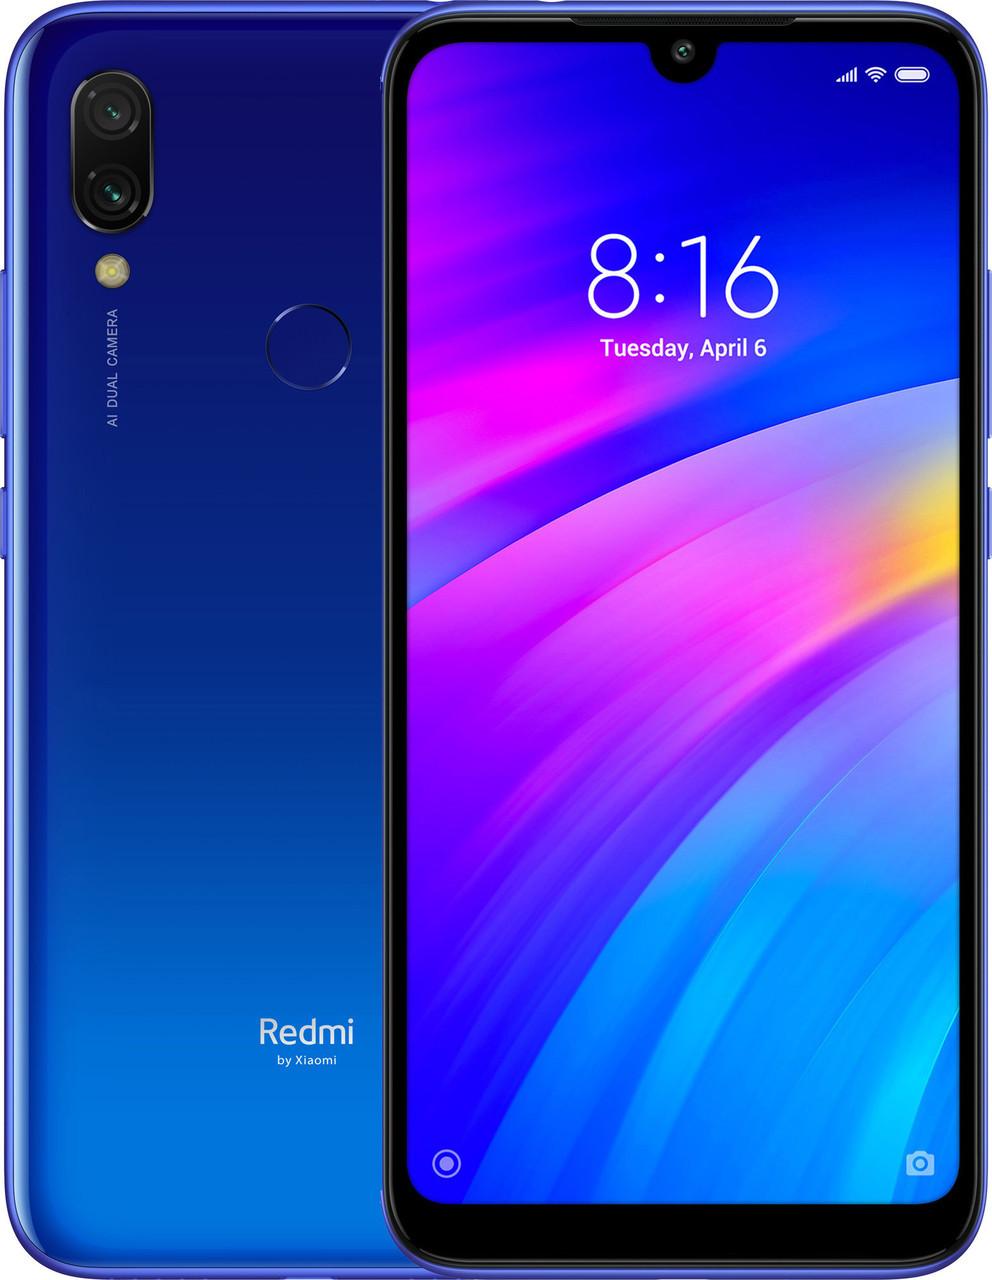 Смартфон Xiaomi Redmi 7 2/16Gb Global Version Оригинал Гарантия 3 месяца Comet Blue